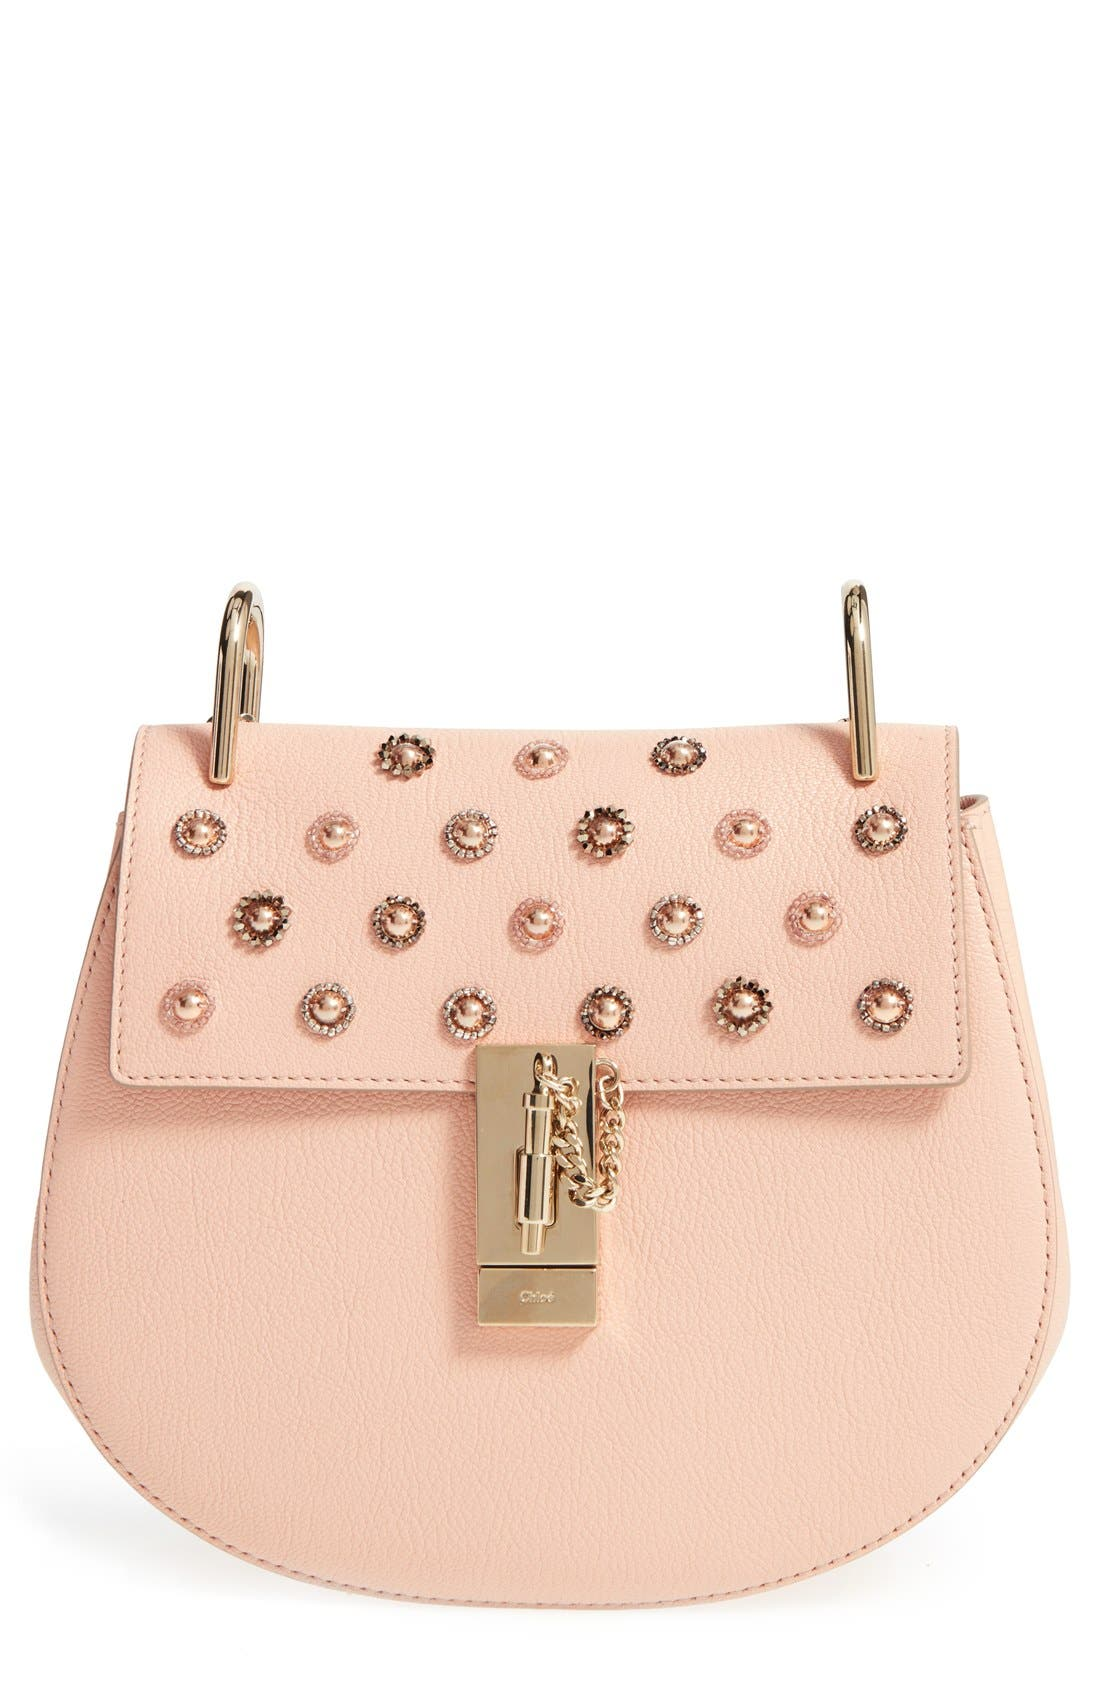 Main Image - Chloé 'Small Drew' Goatskin Leather Shoulder Bag